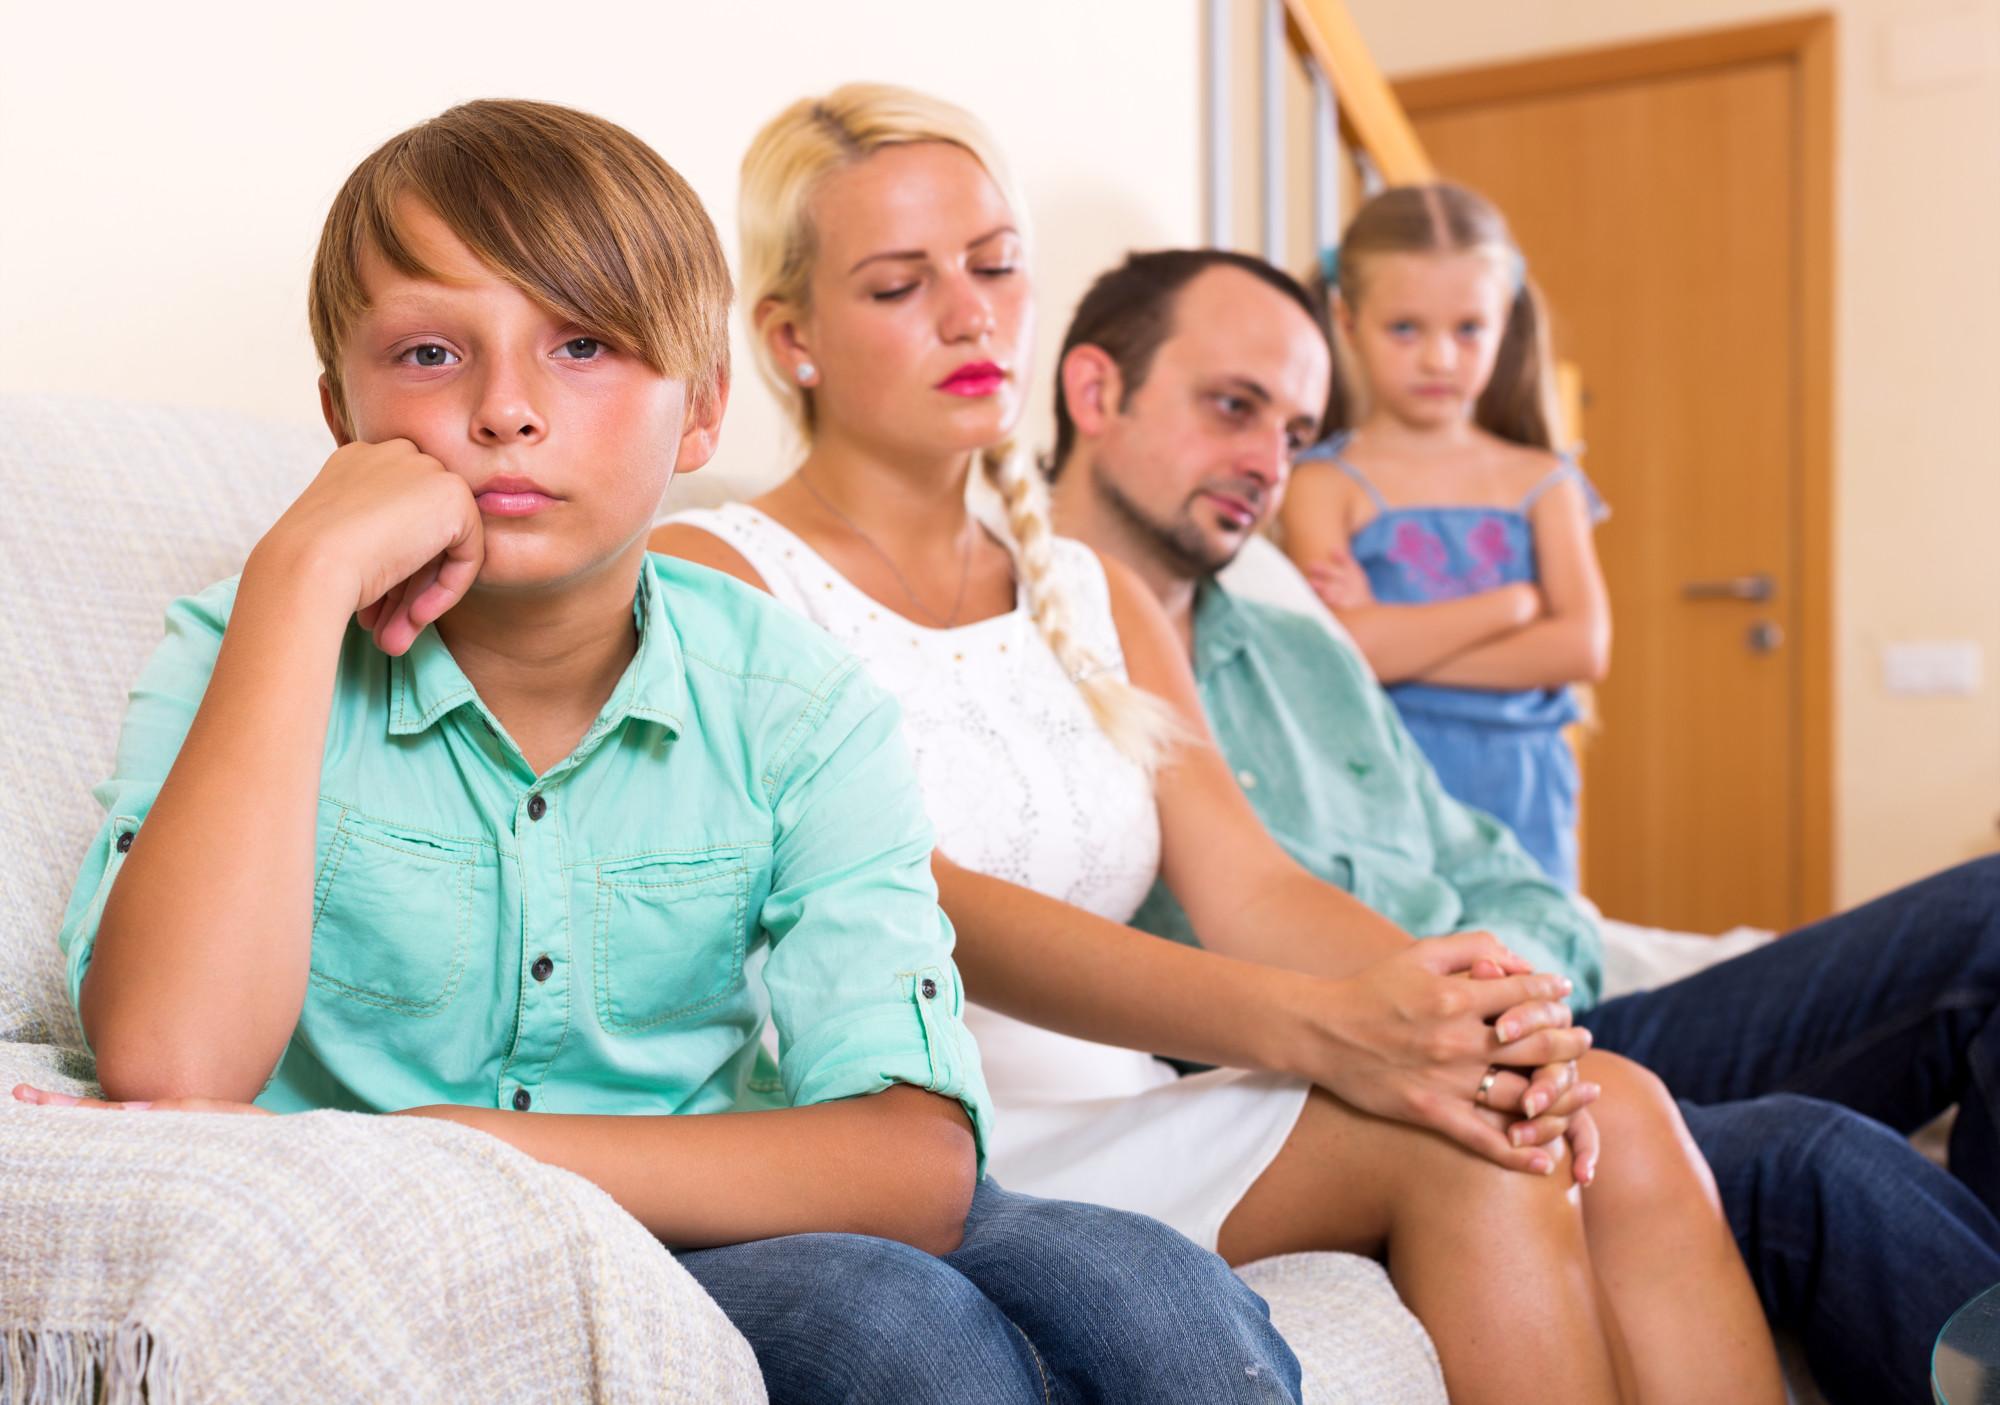 Parental divorce